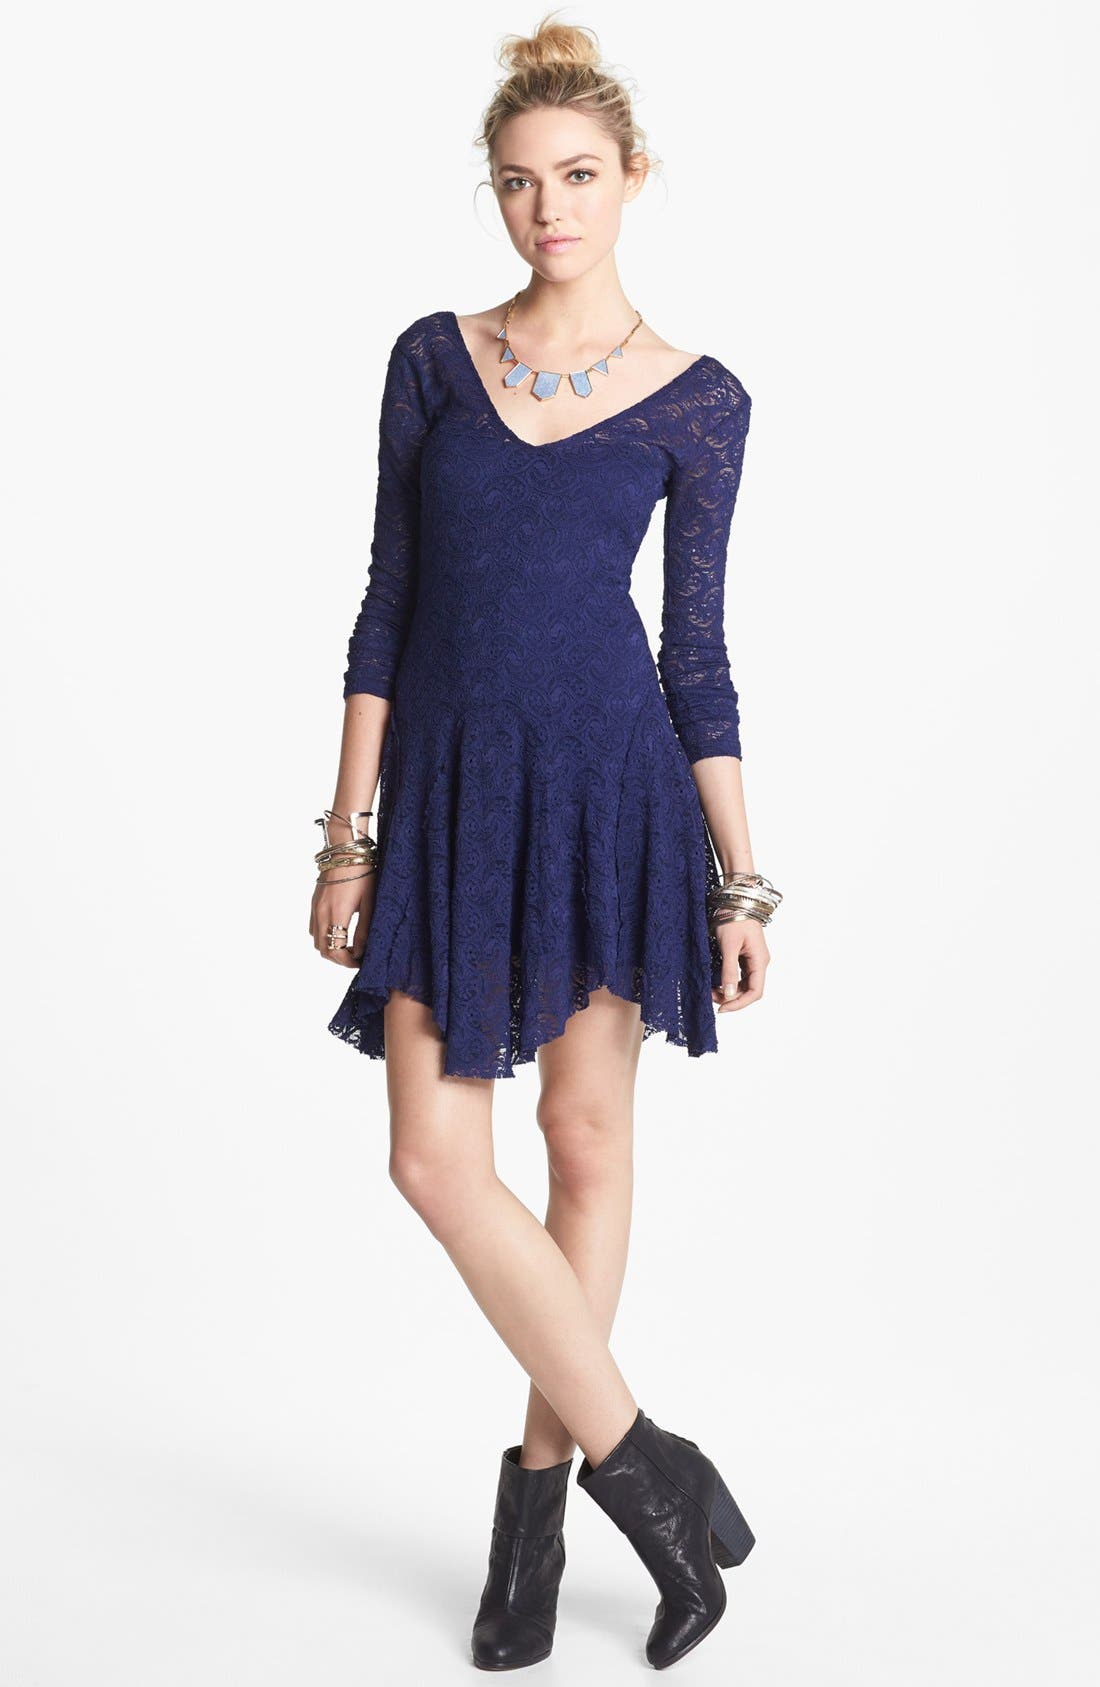 Alternate Image 1 Selected - Free People 'Katya' Paisley Lace Dress